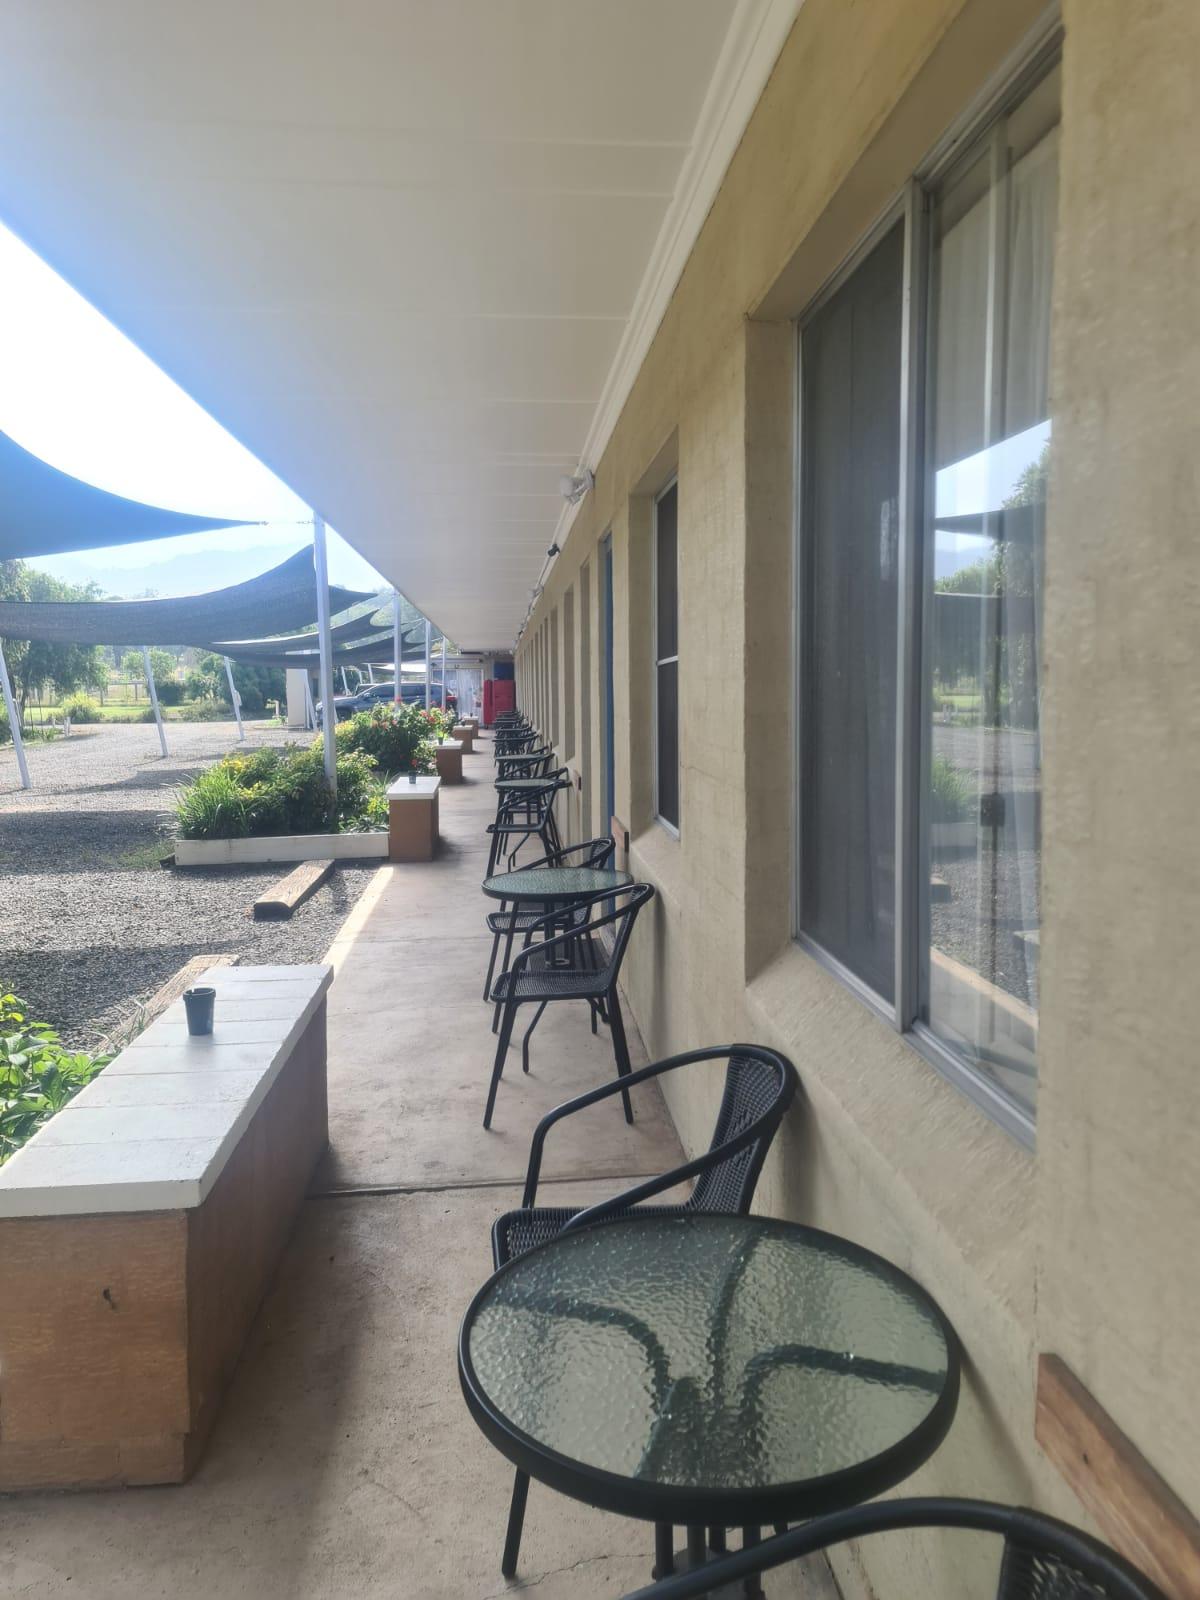 Valley View Motel